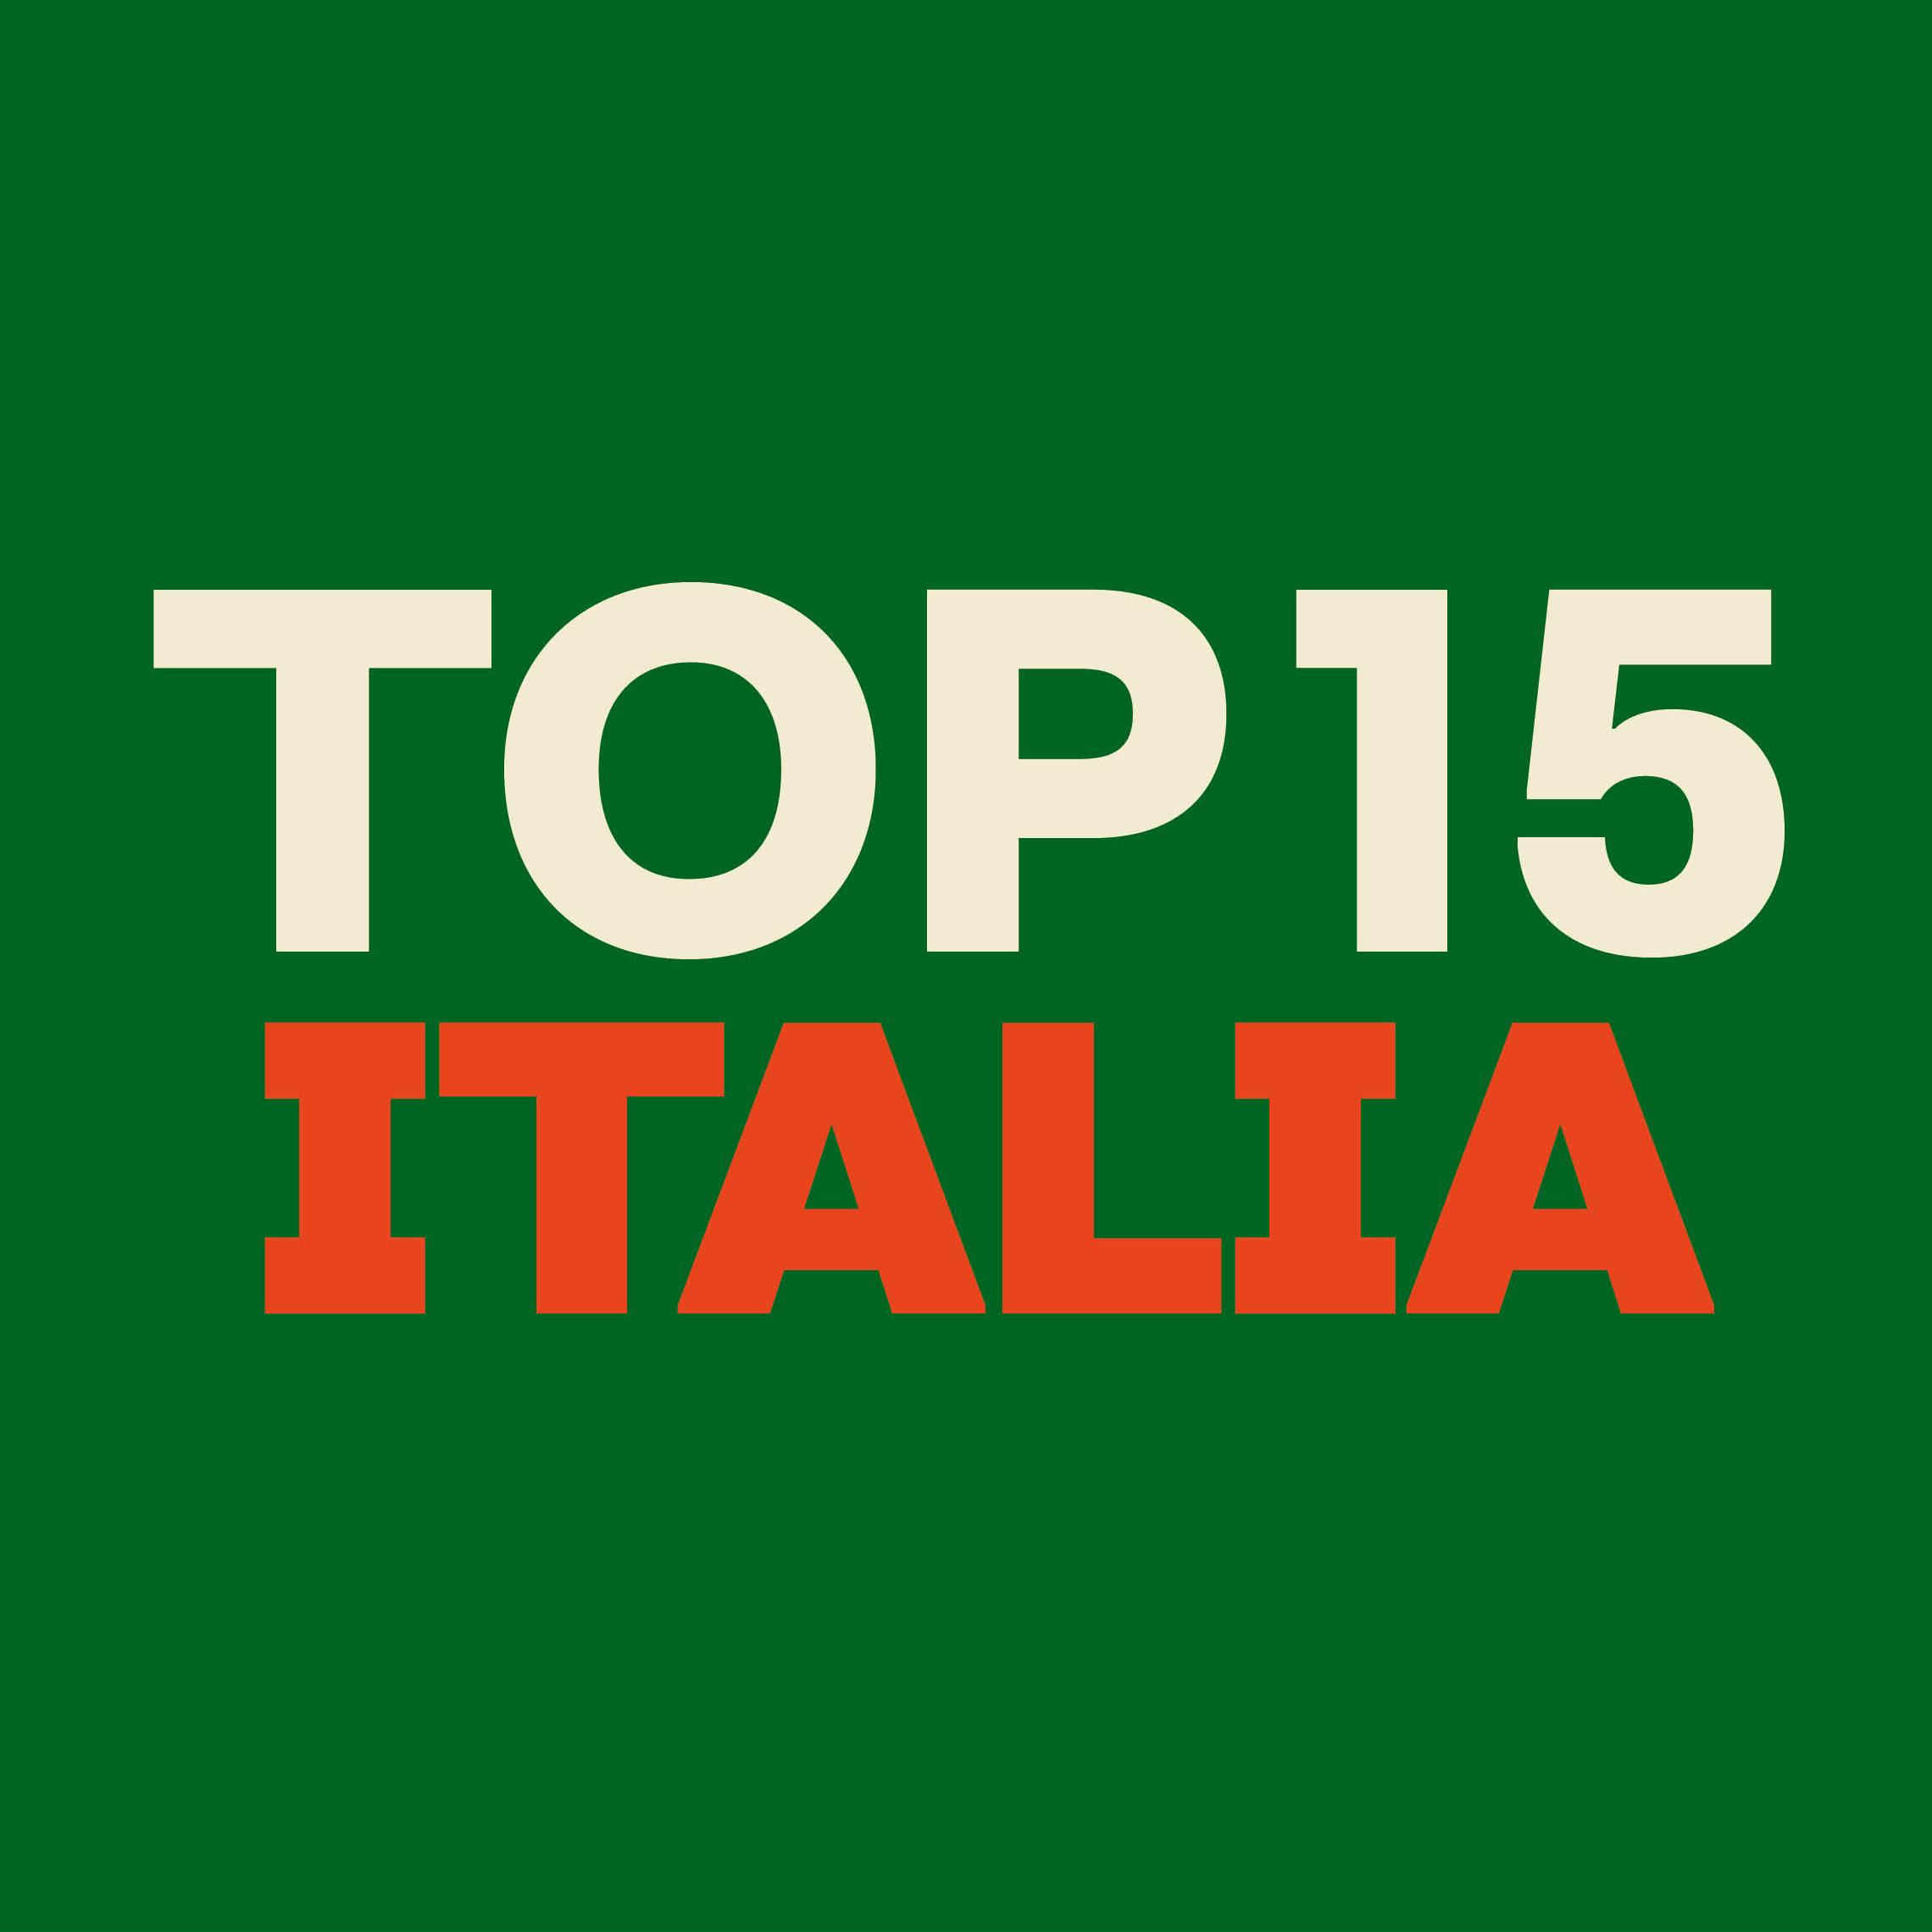 TOP15-ITALIA-ID